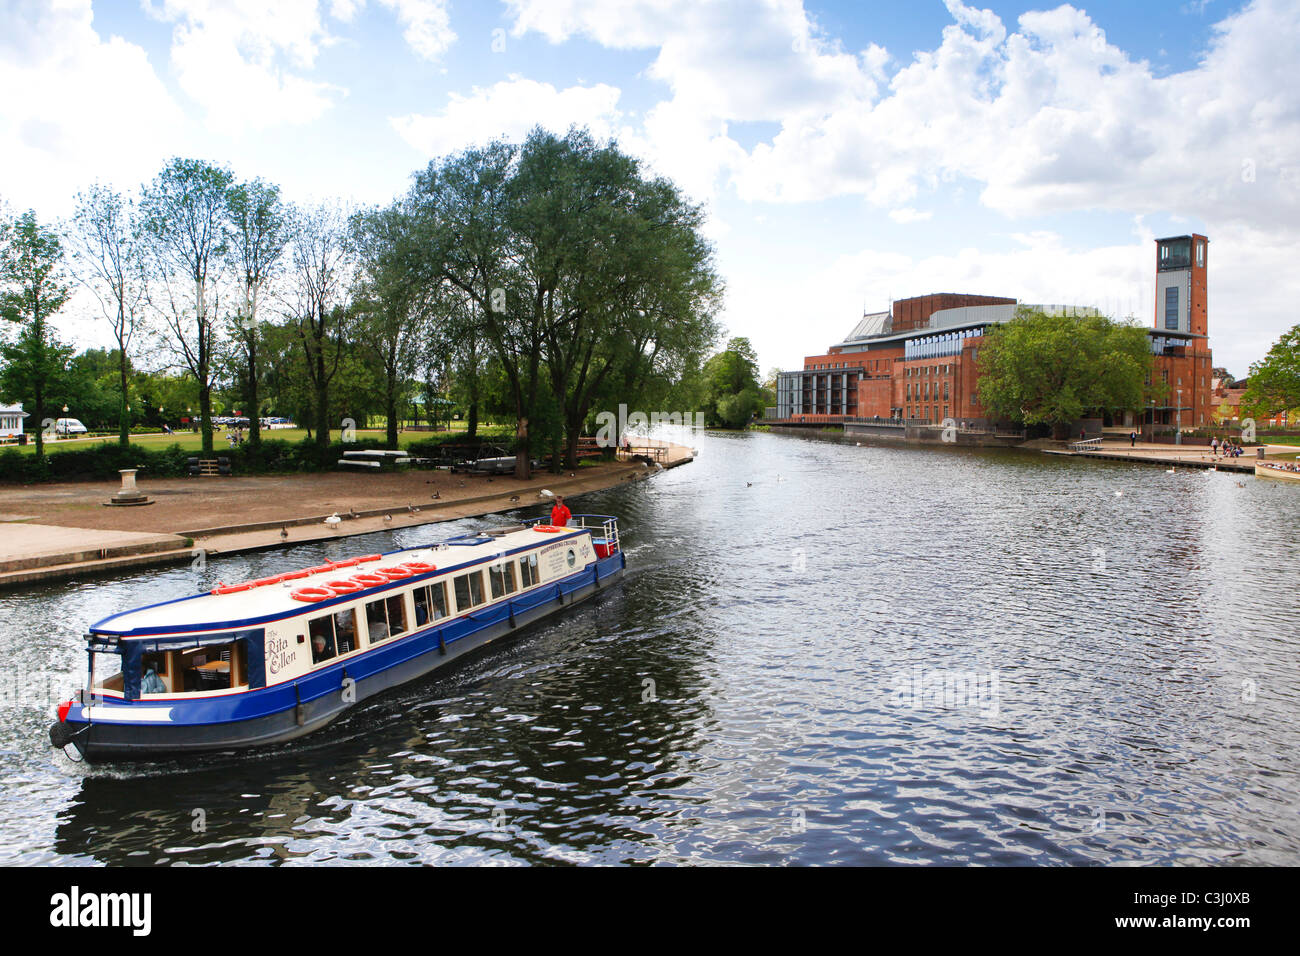 Boat on the River Avon in Stratford-upon-Avon, Warwickshire. - Stock Image